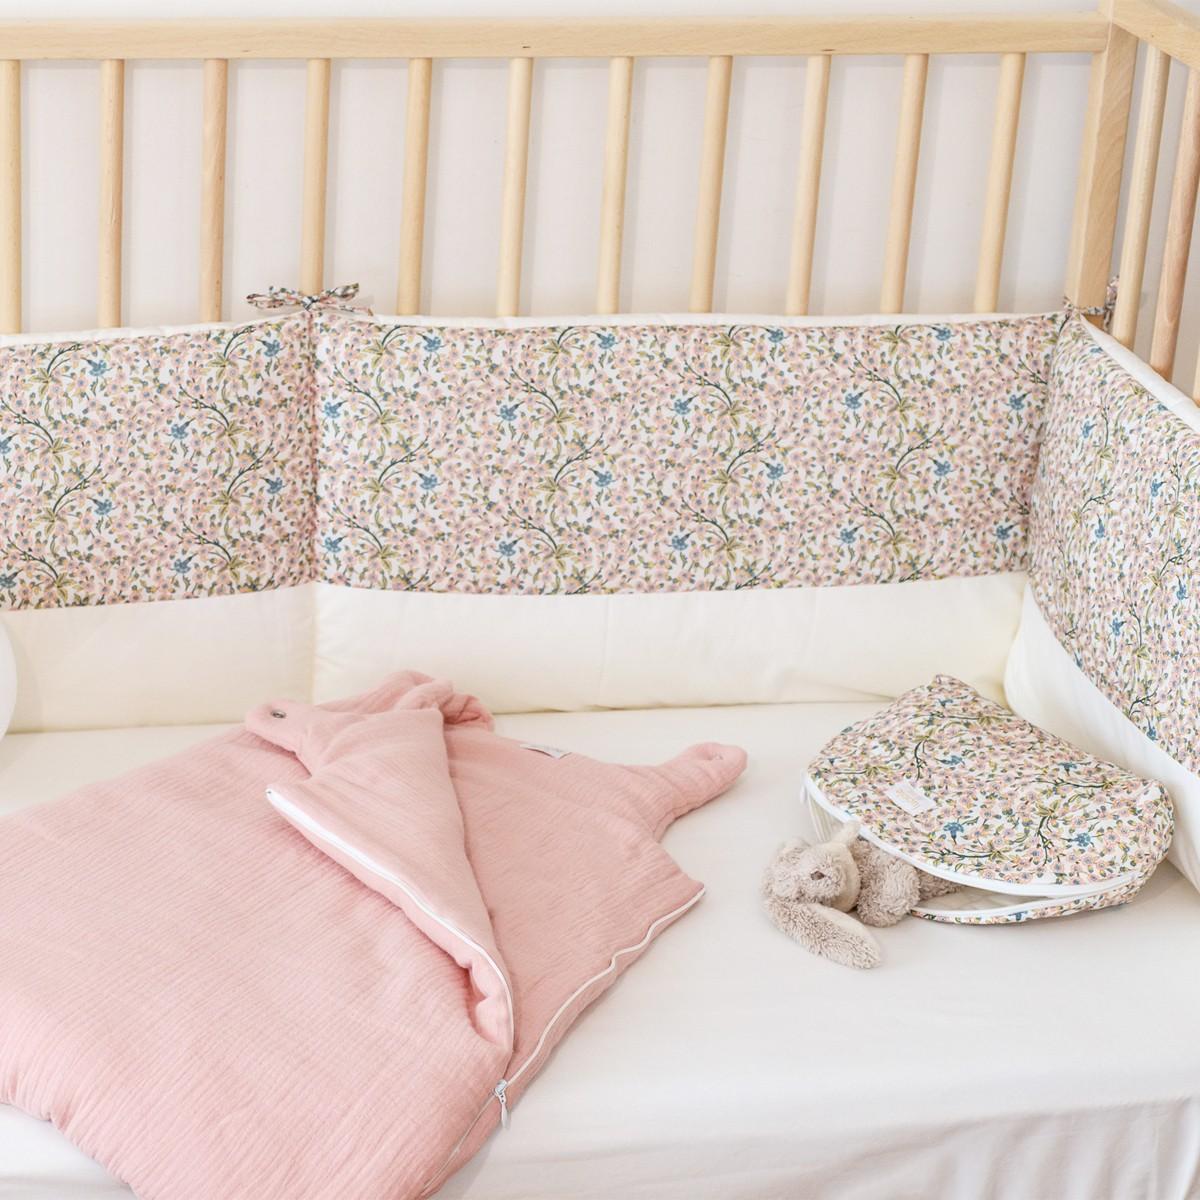 Tour de lit bébé fille liberty Empress rose